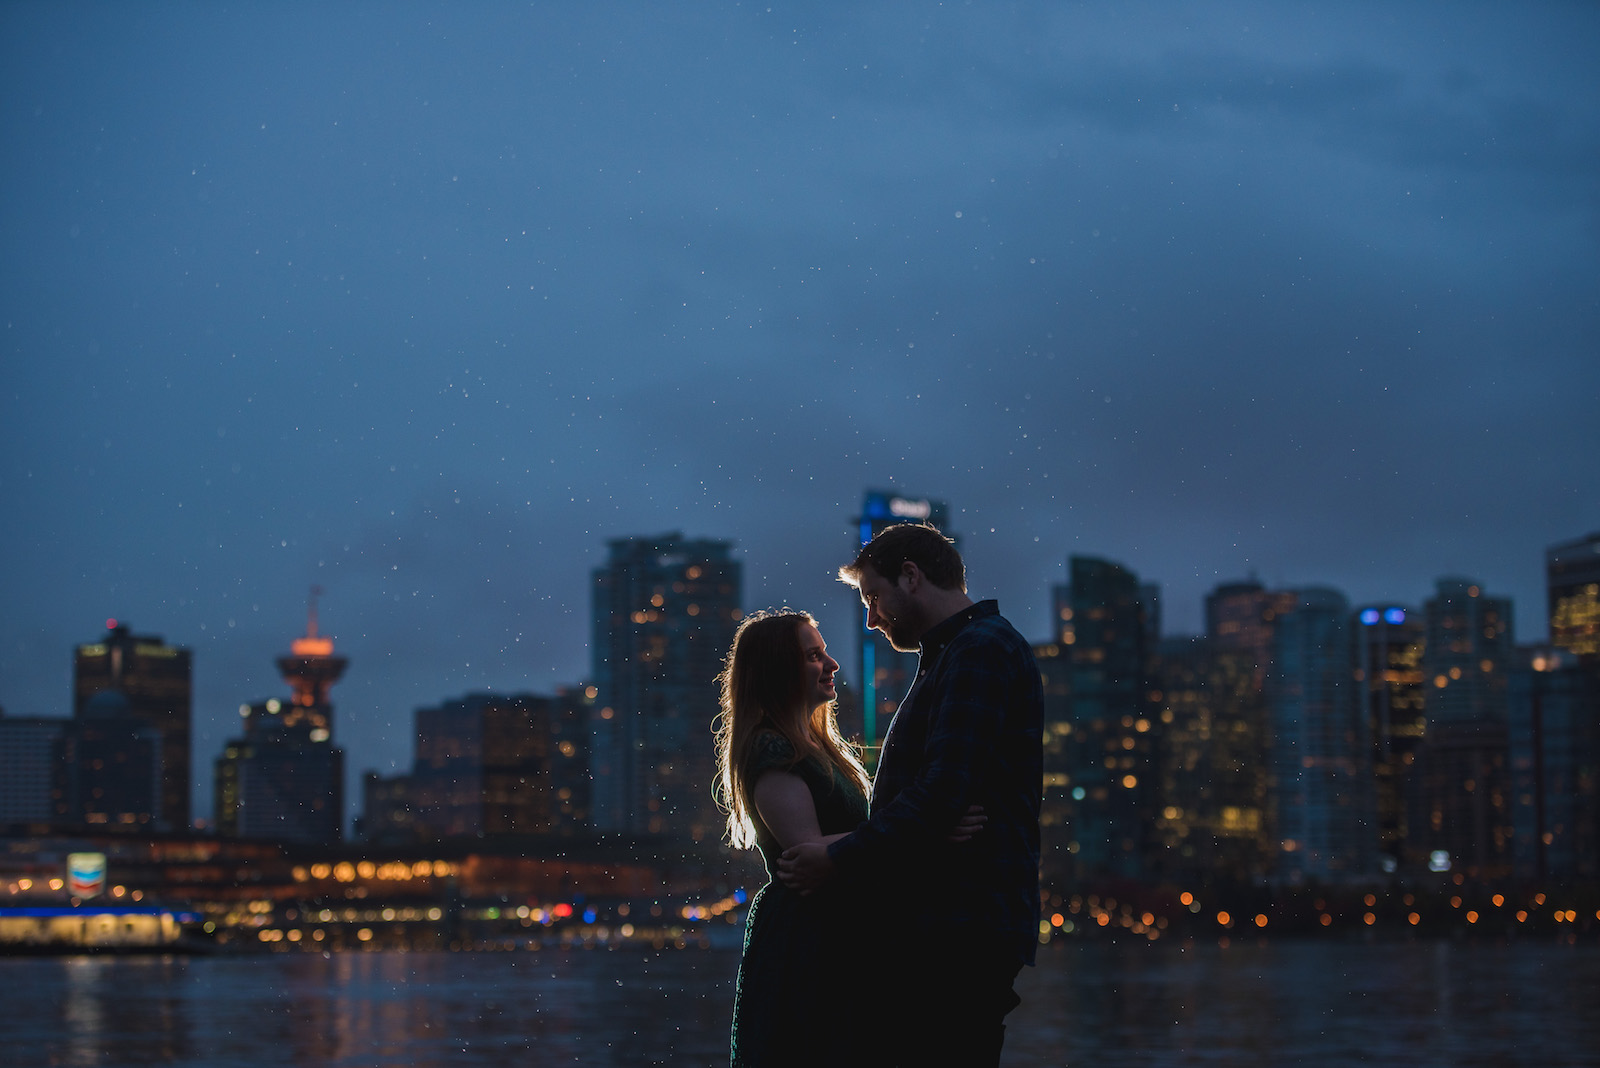 vancouver-island-wedding-photographers-rainy-stanley-park-engagement-14.jpg